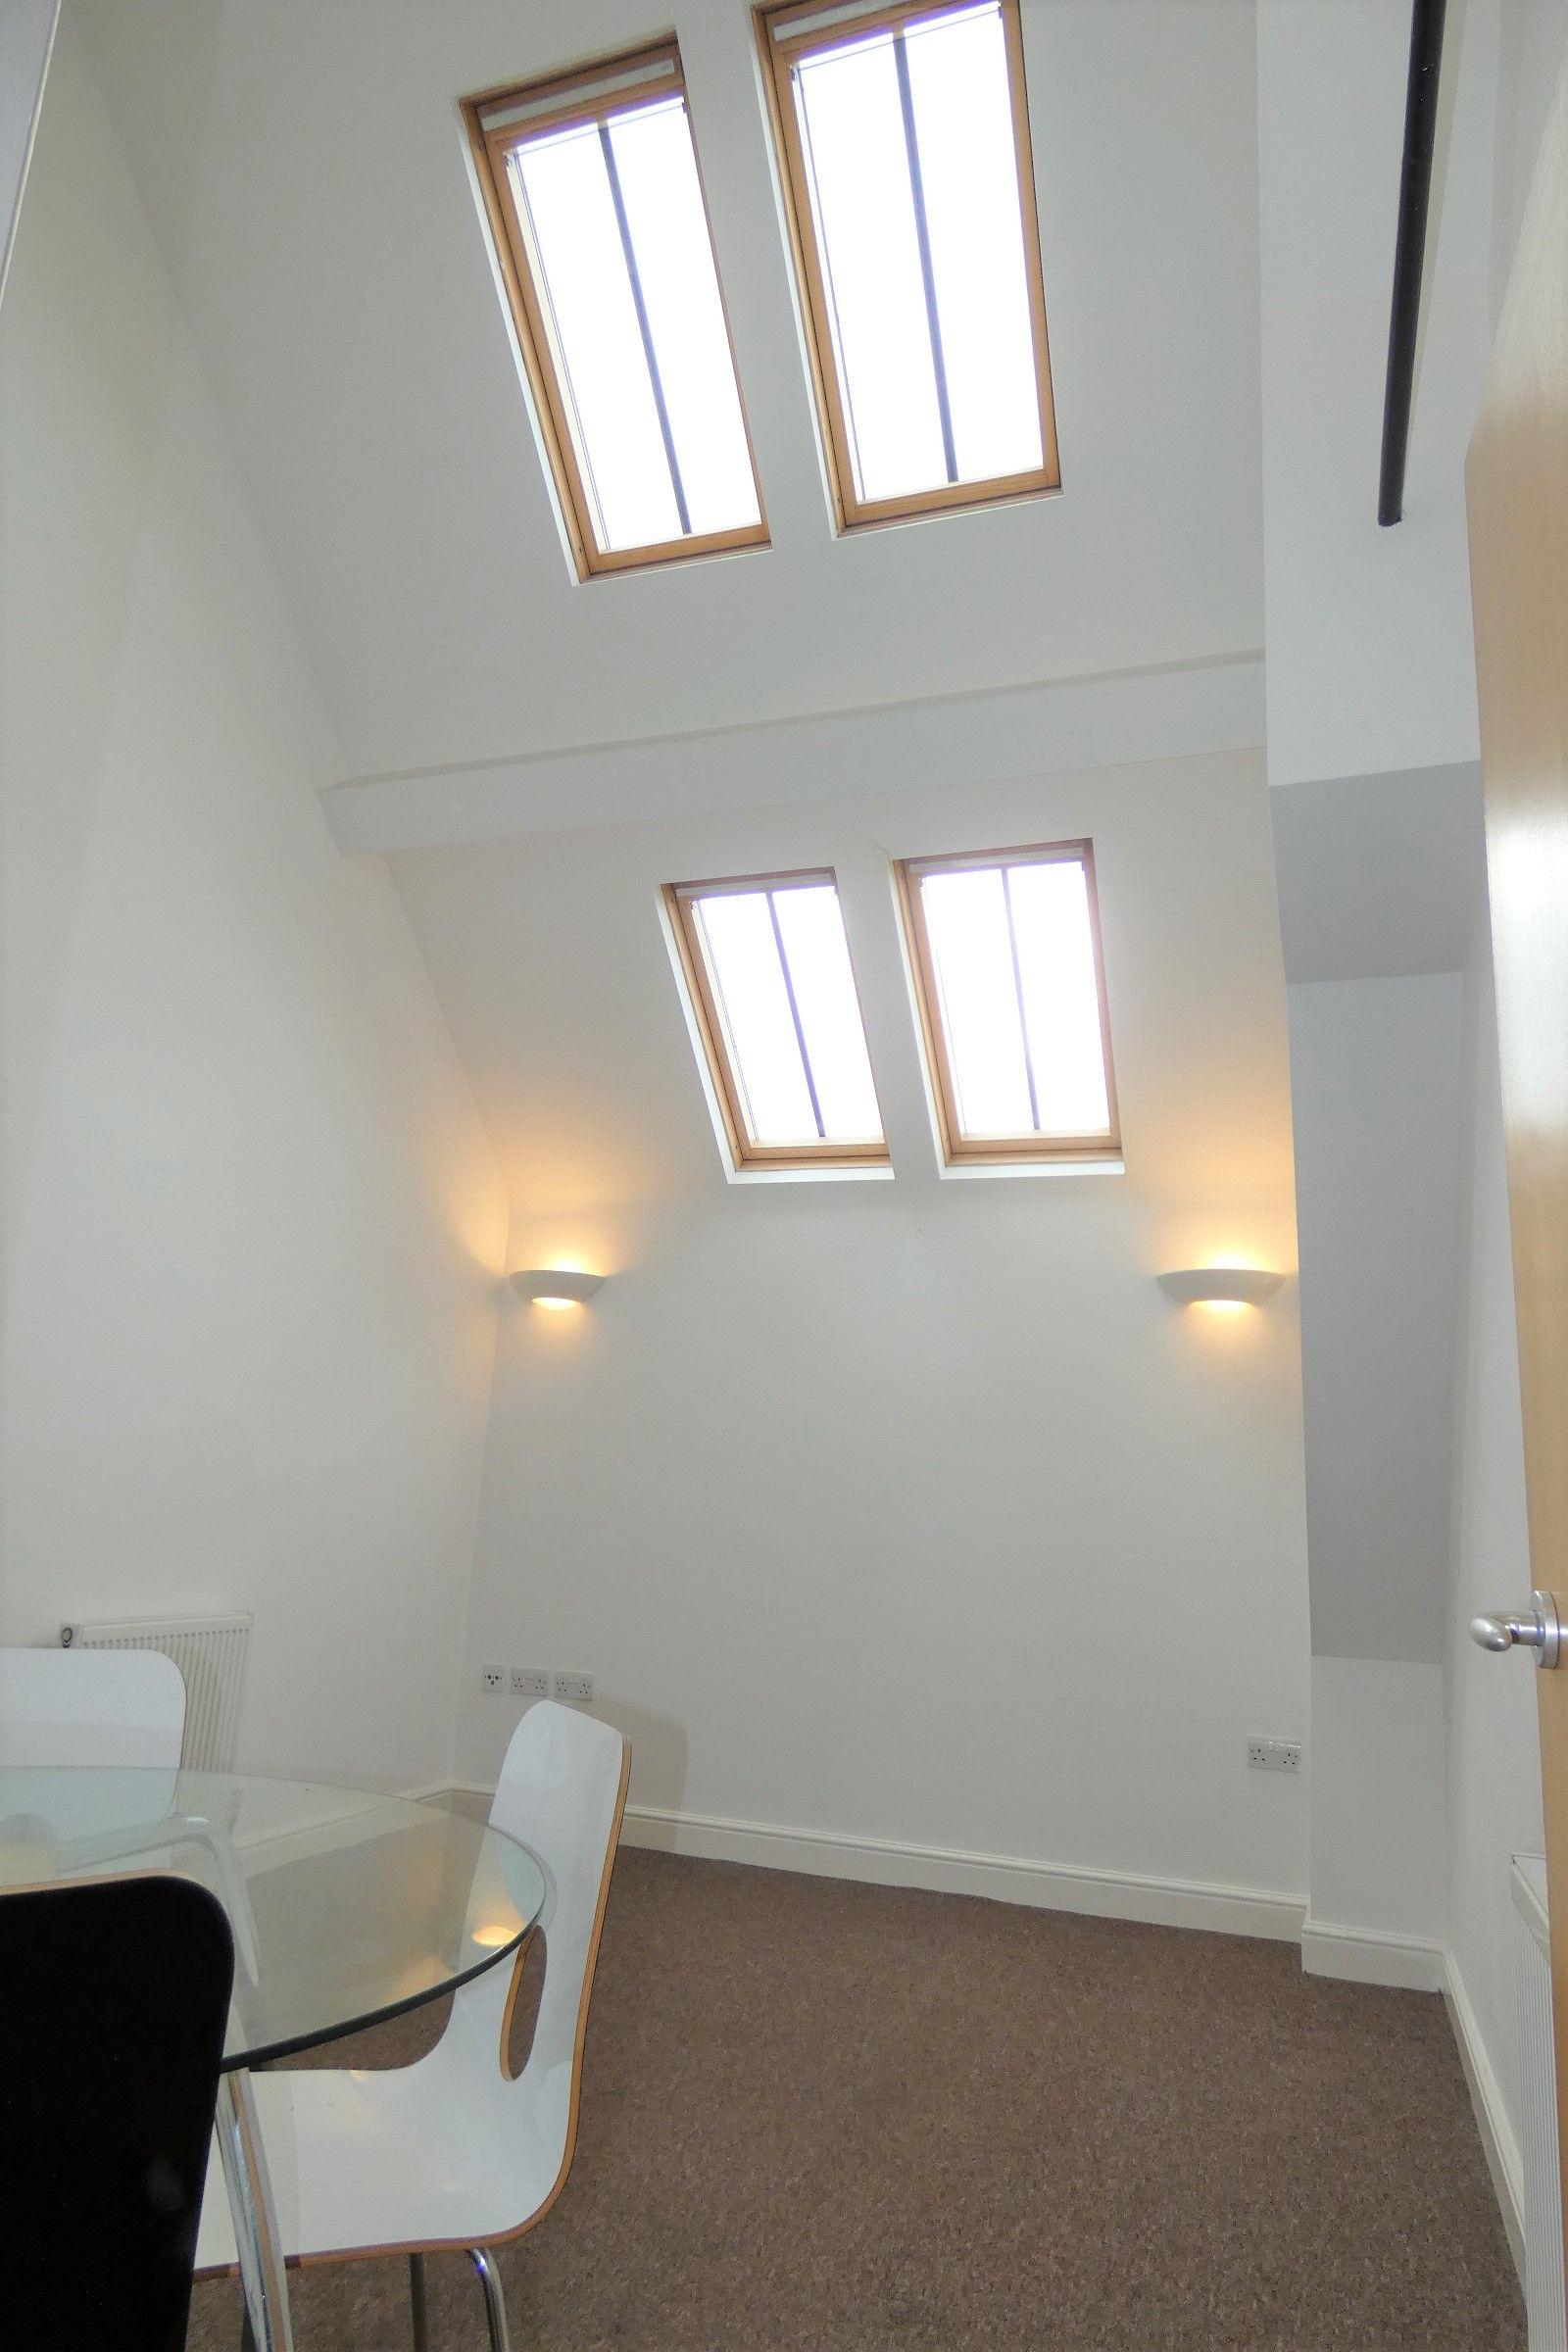 1 bedroom apartment flat/apartment For Sale in Hebden Bridge - Property photograph